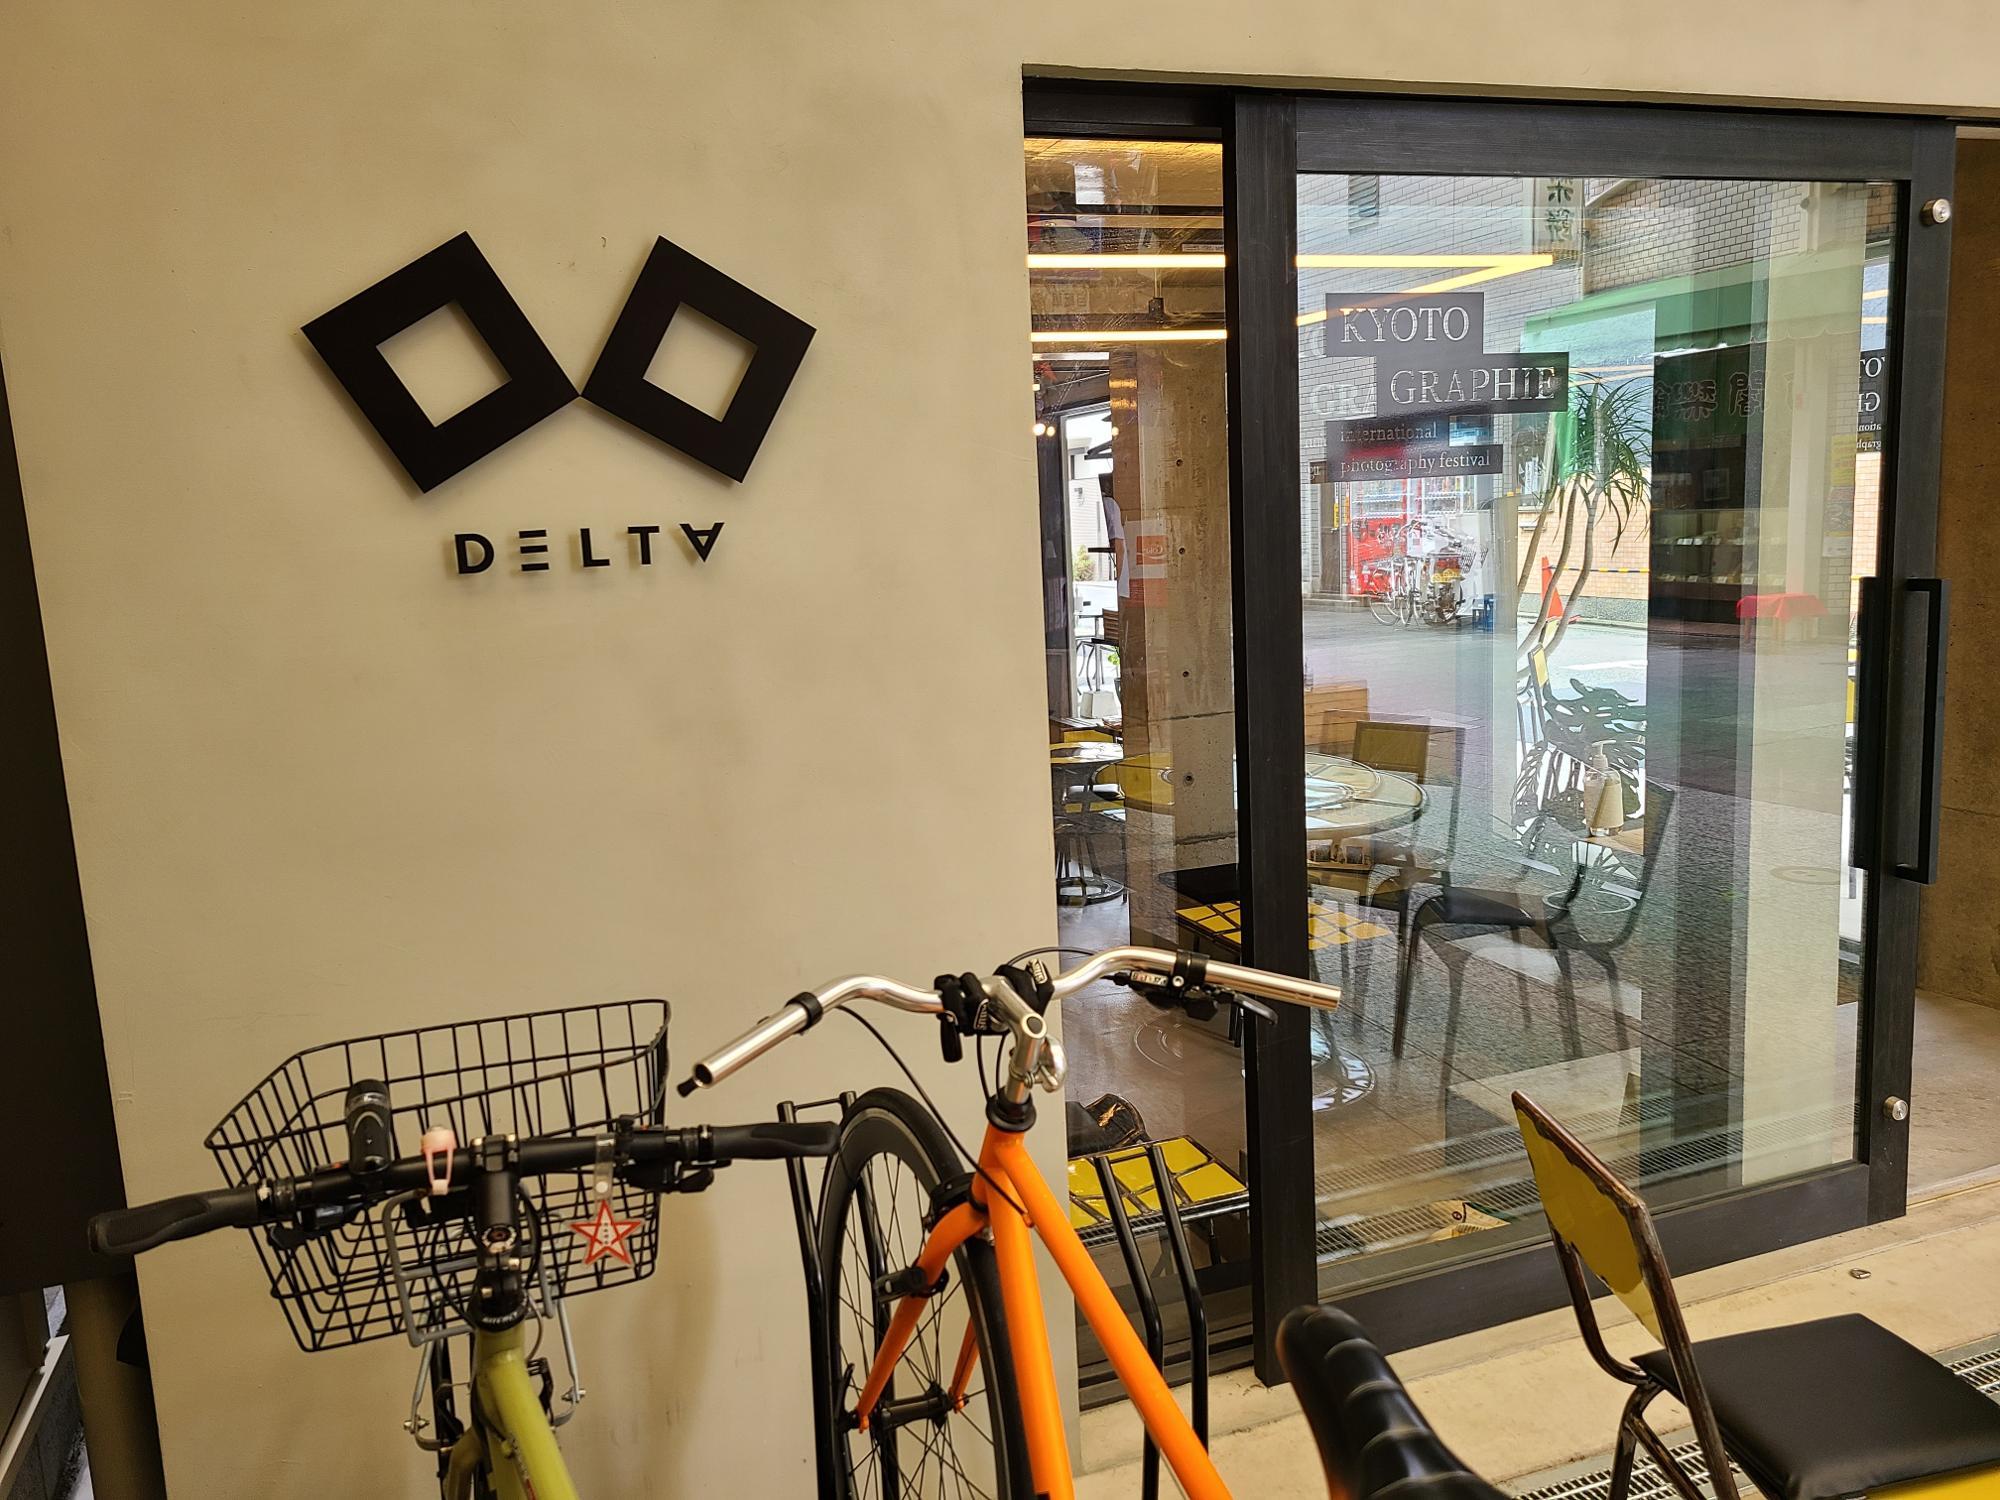 DELTA / KYOTOGRAPHIE Permanent Space